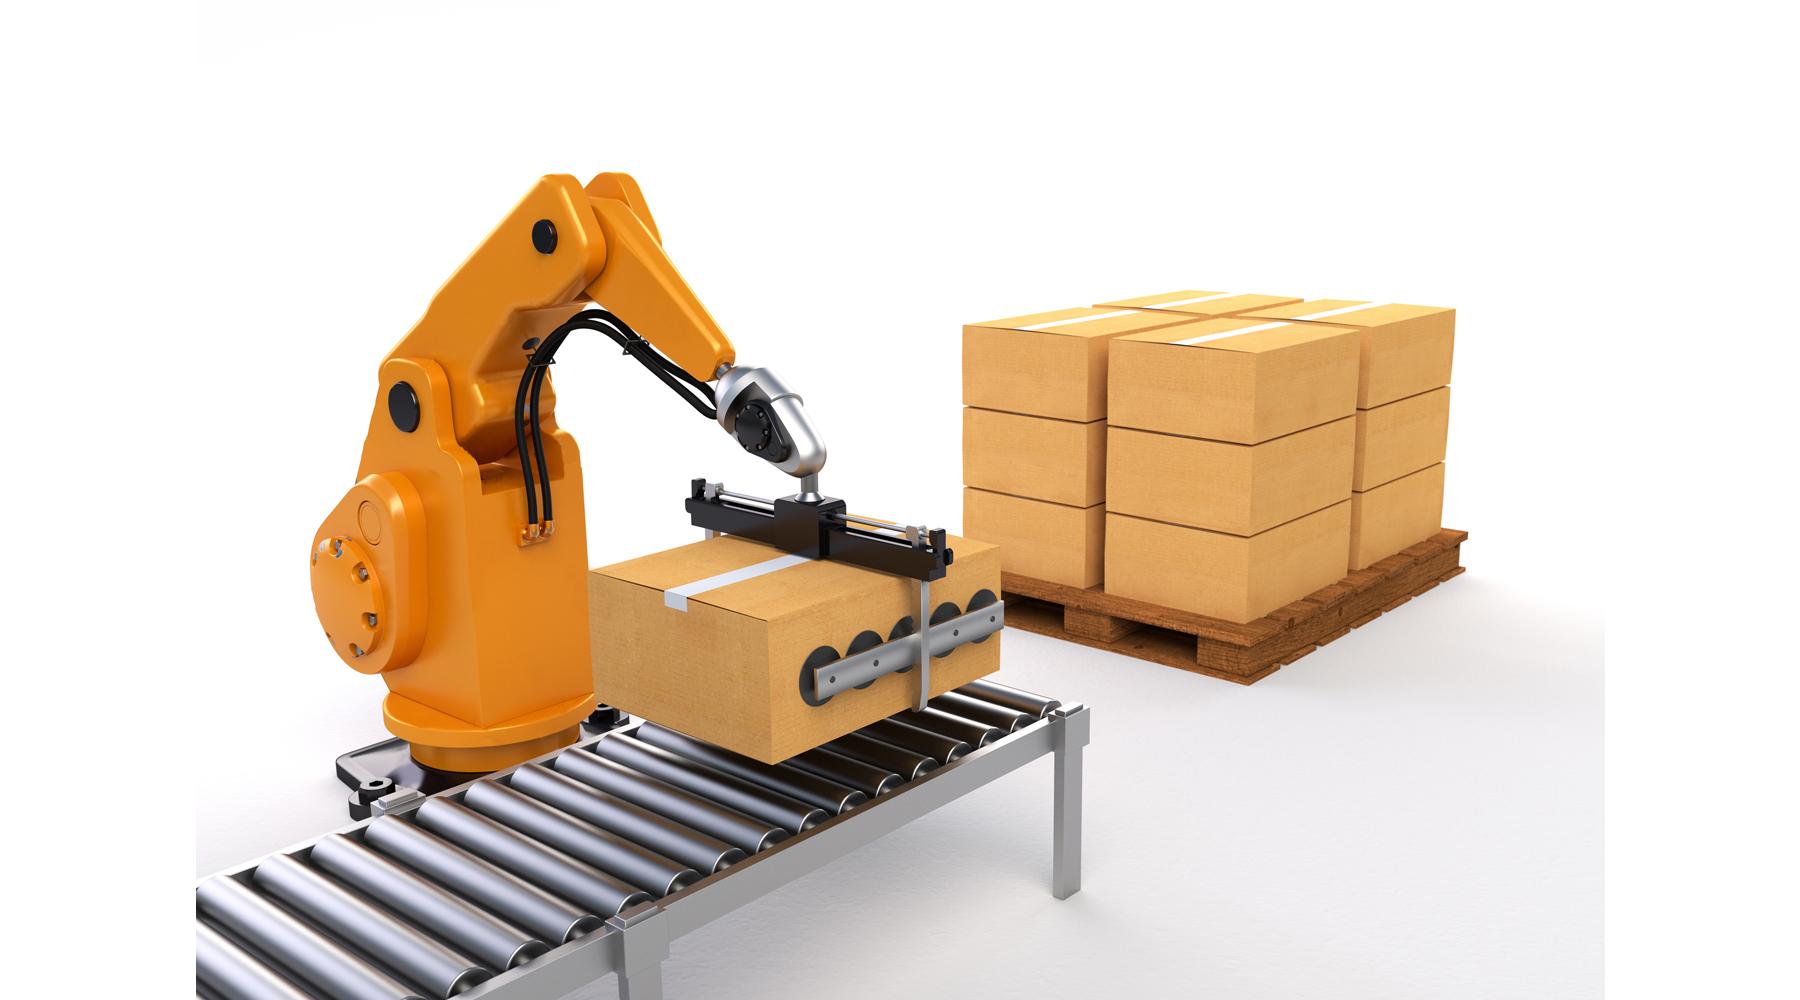 Robot Paletizador para cajas, sacos, contenedores